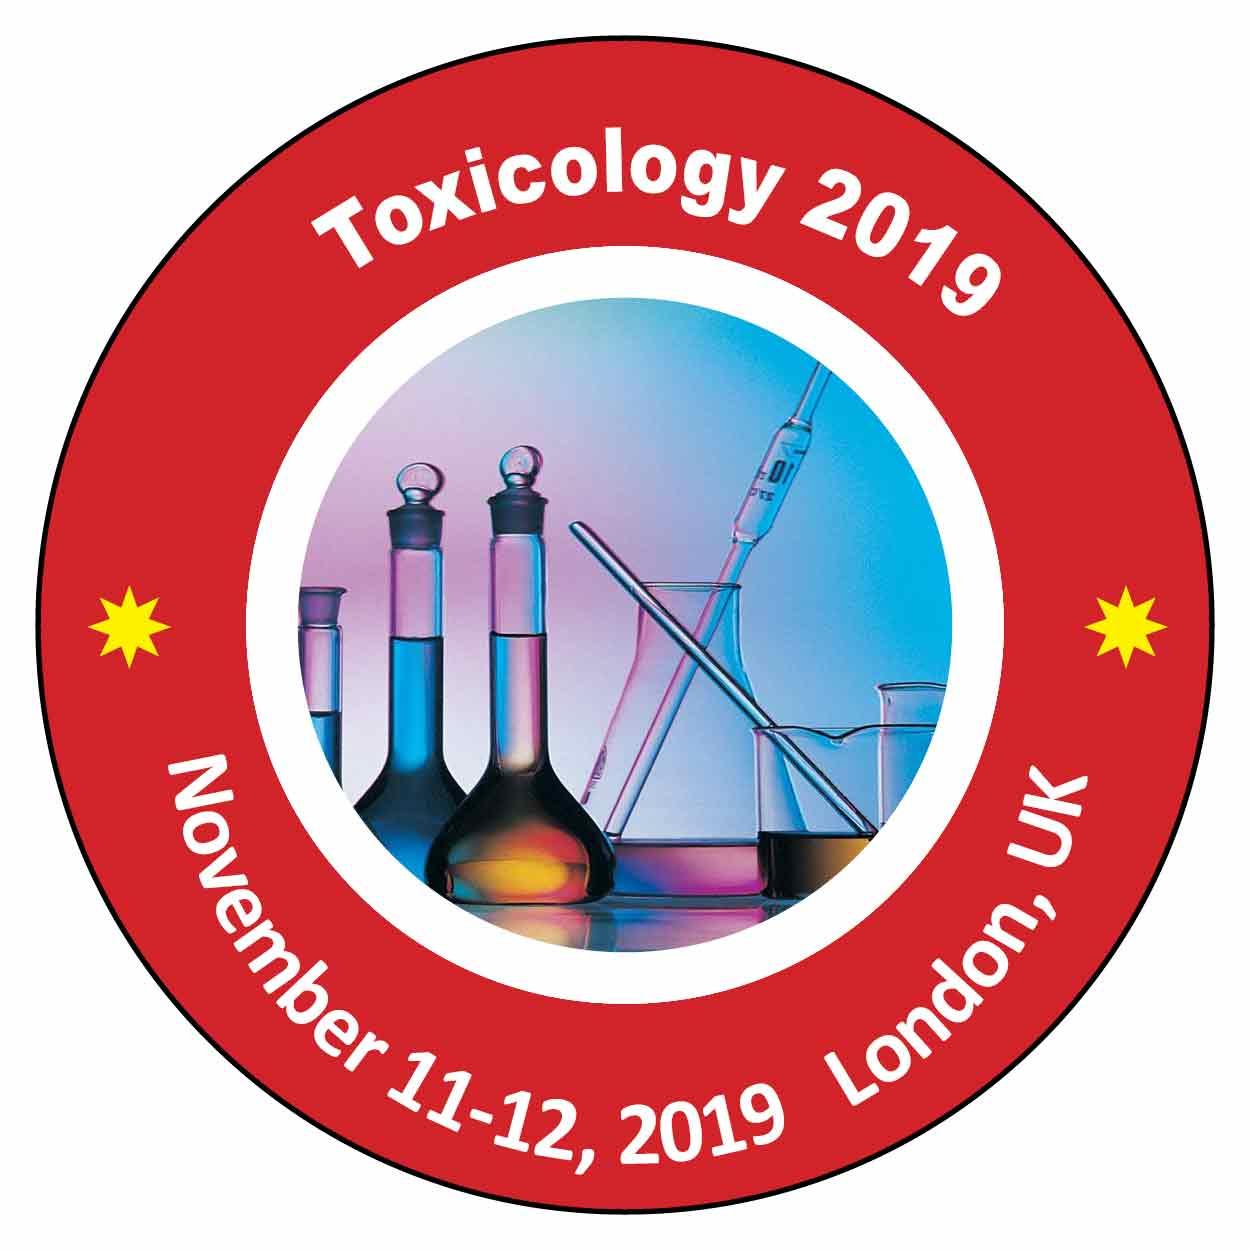 Toxicology 2019 | Toxicology conference | Toxicology